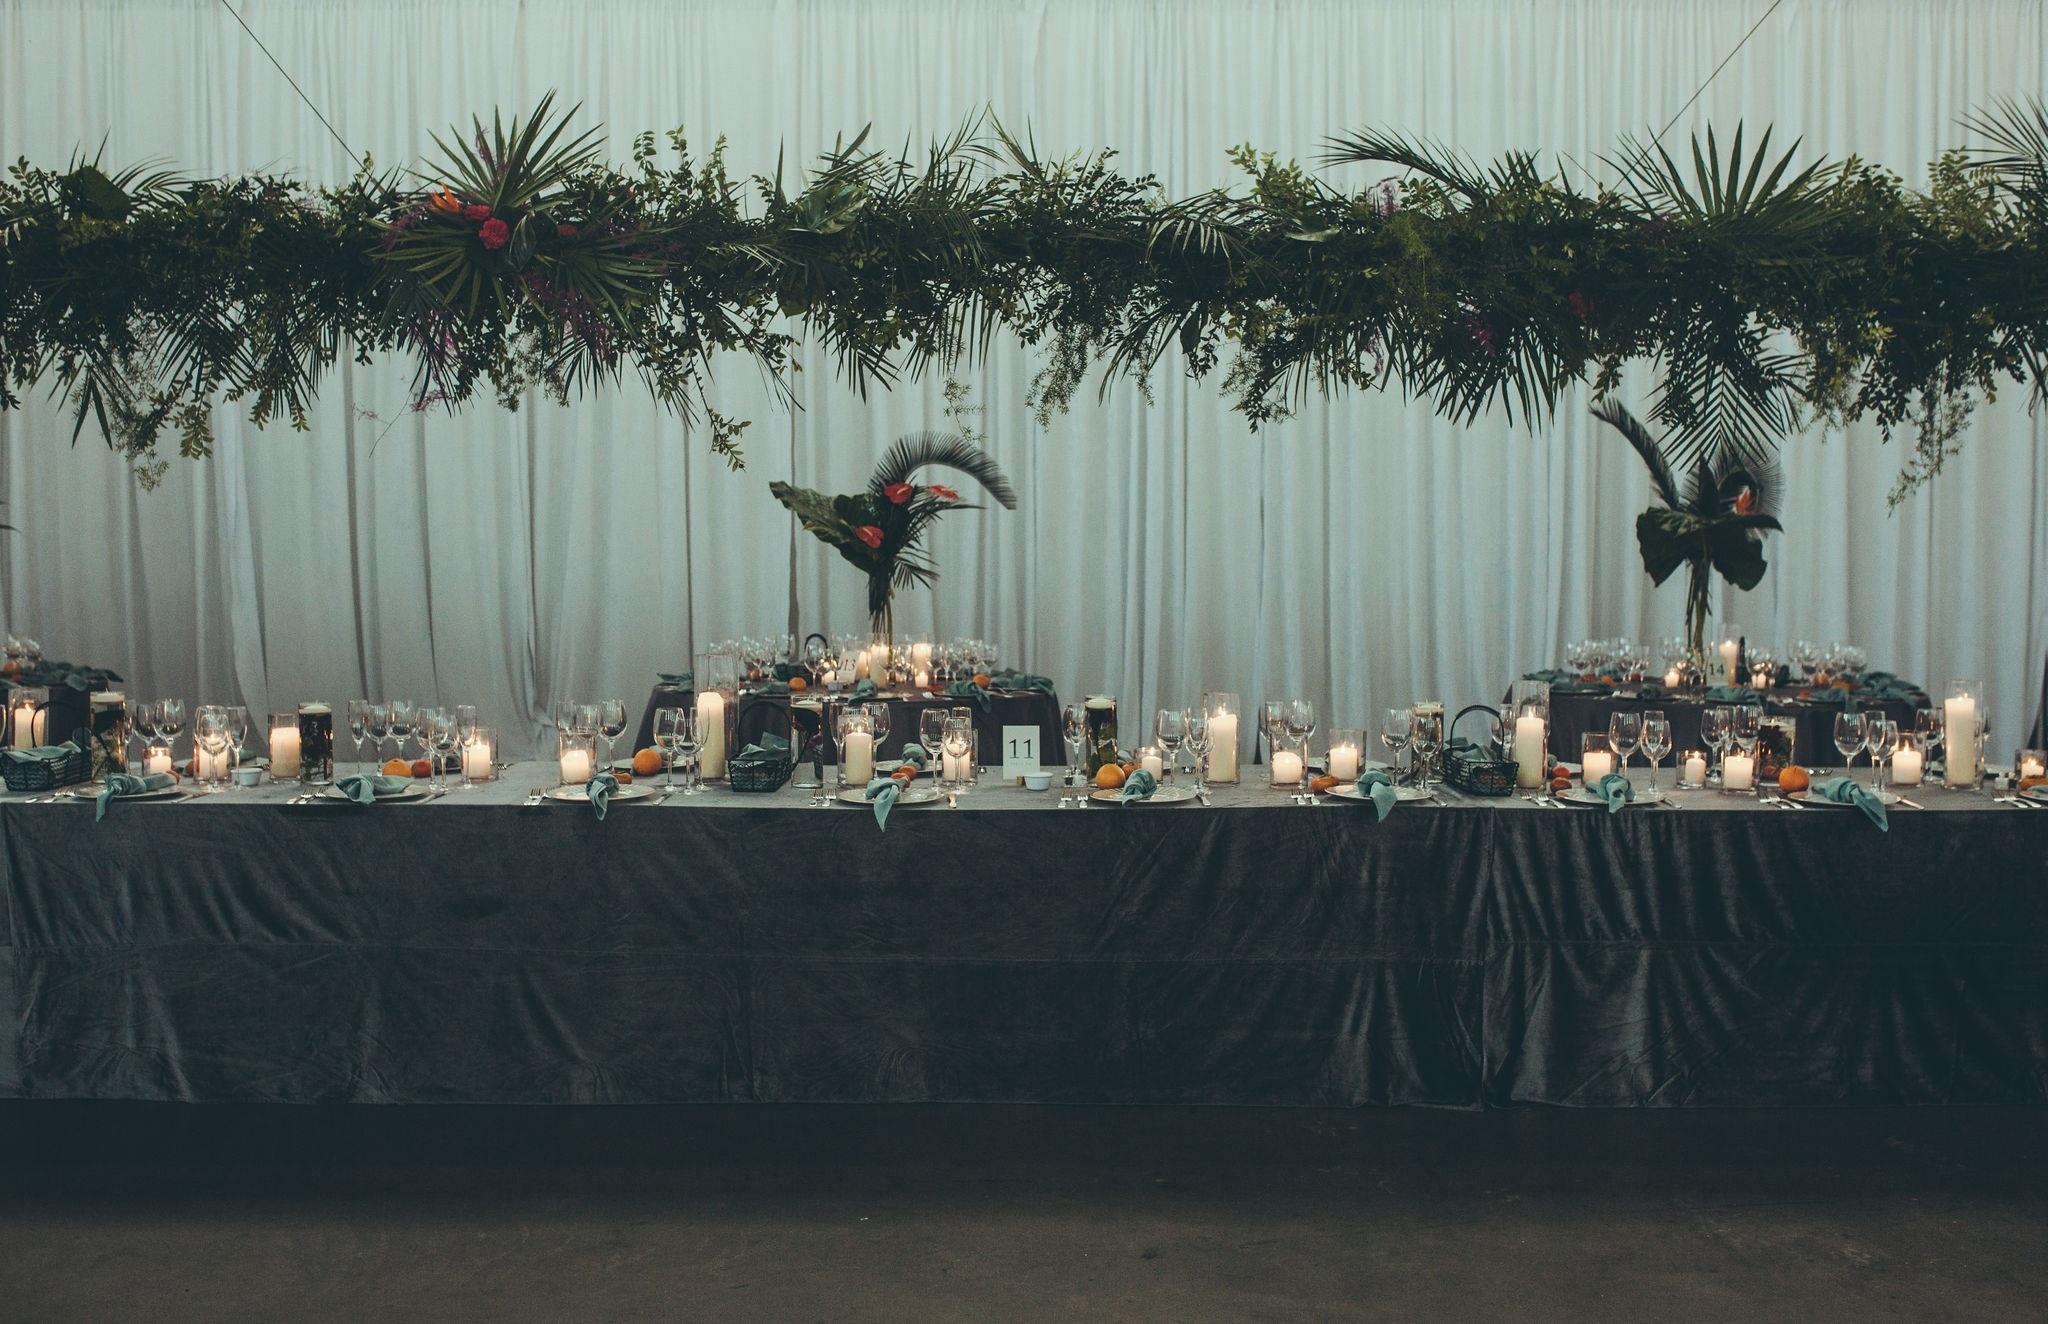 06_Soraya&Mike_Wedding_Pre-Ceremony-41.jpg